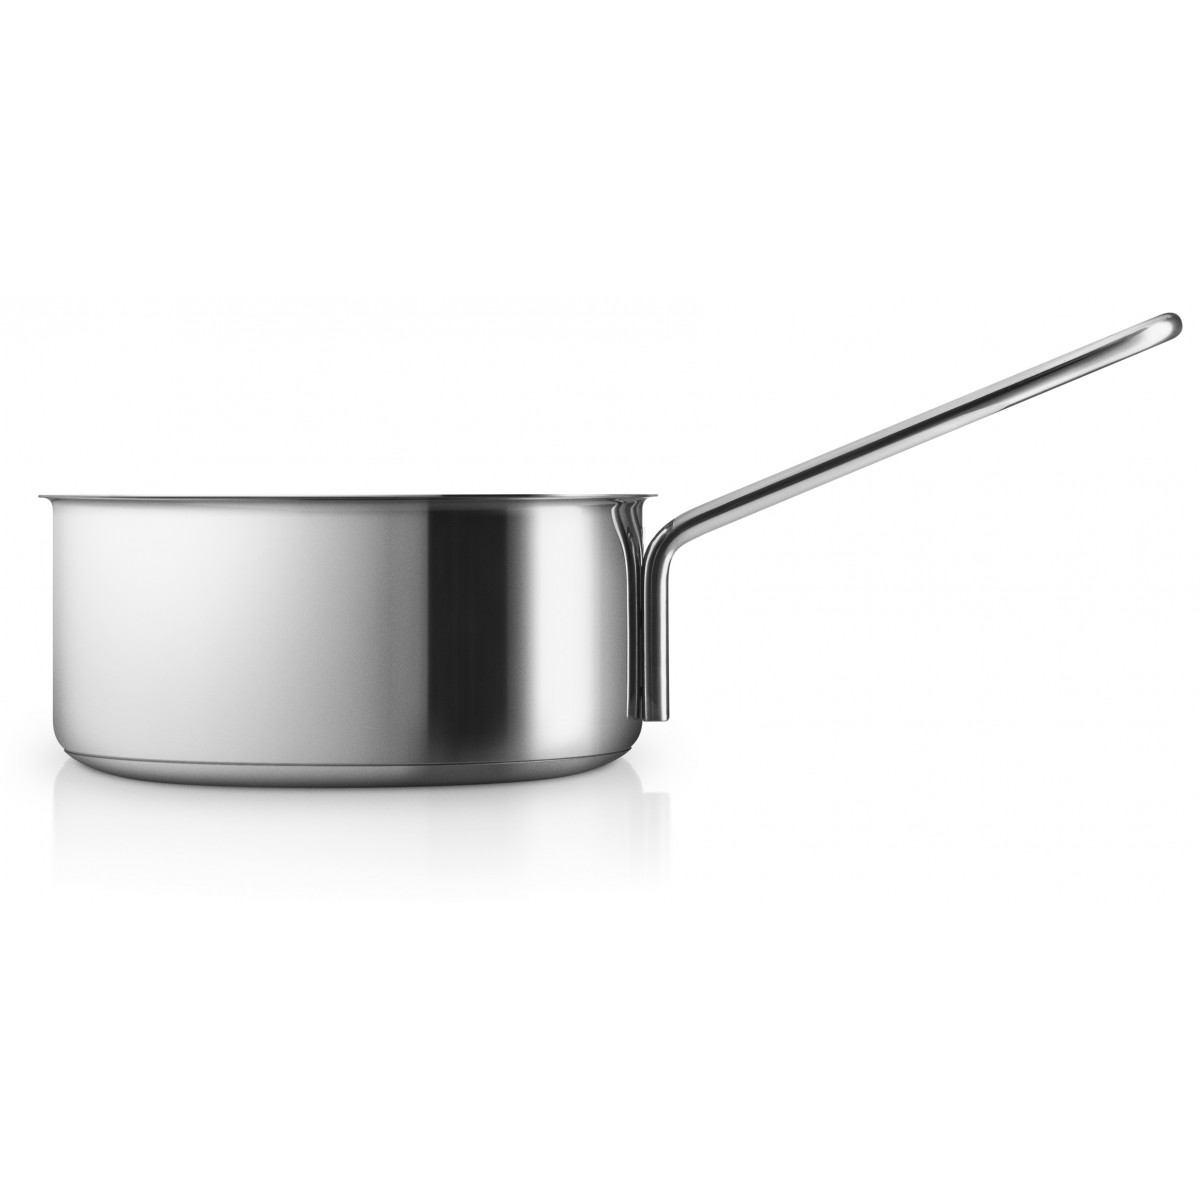 EVA TRIO Sauté kasserolle rustfrit stål 1,3 ltr.